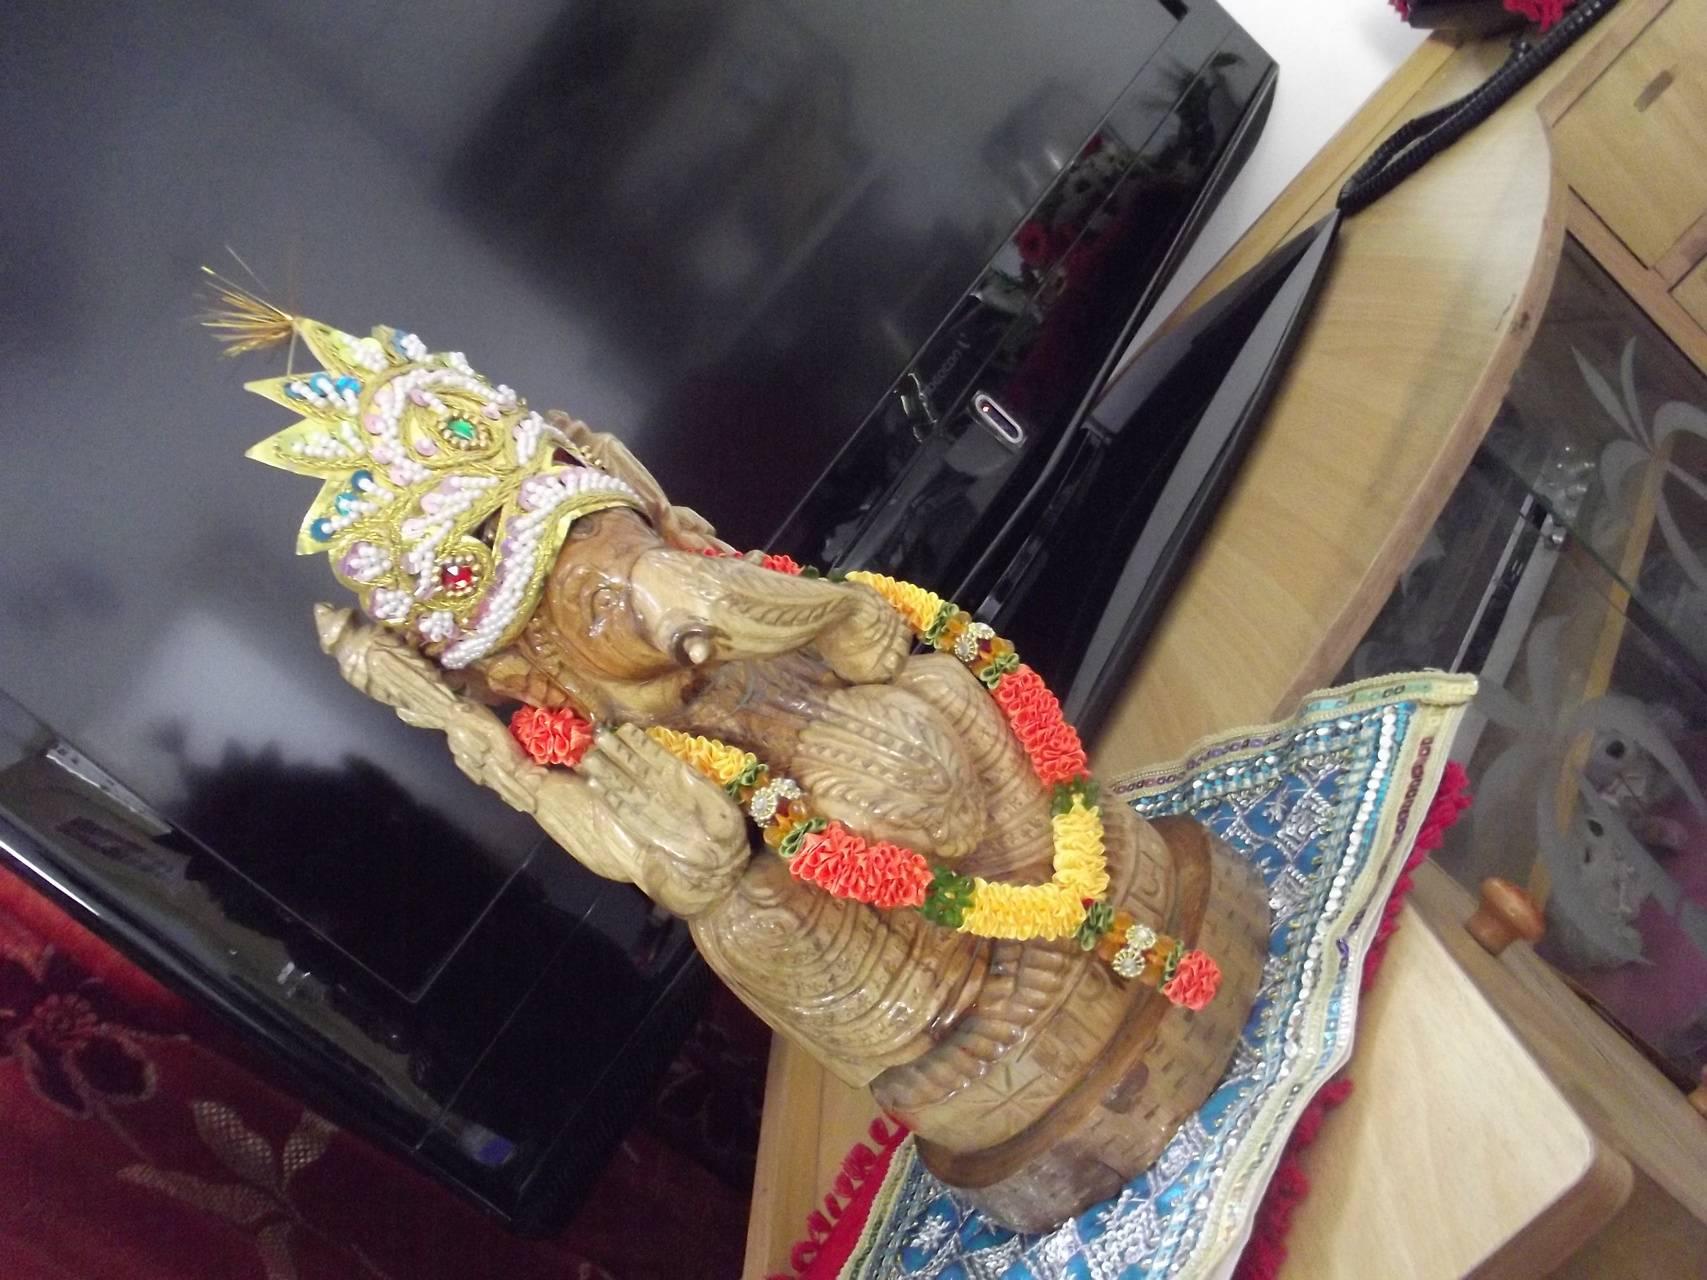 Shree Ganpati Bappa